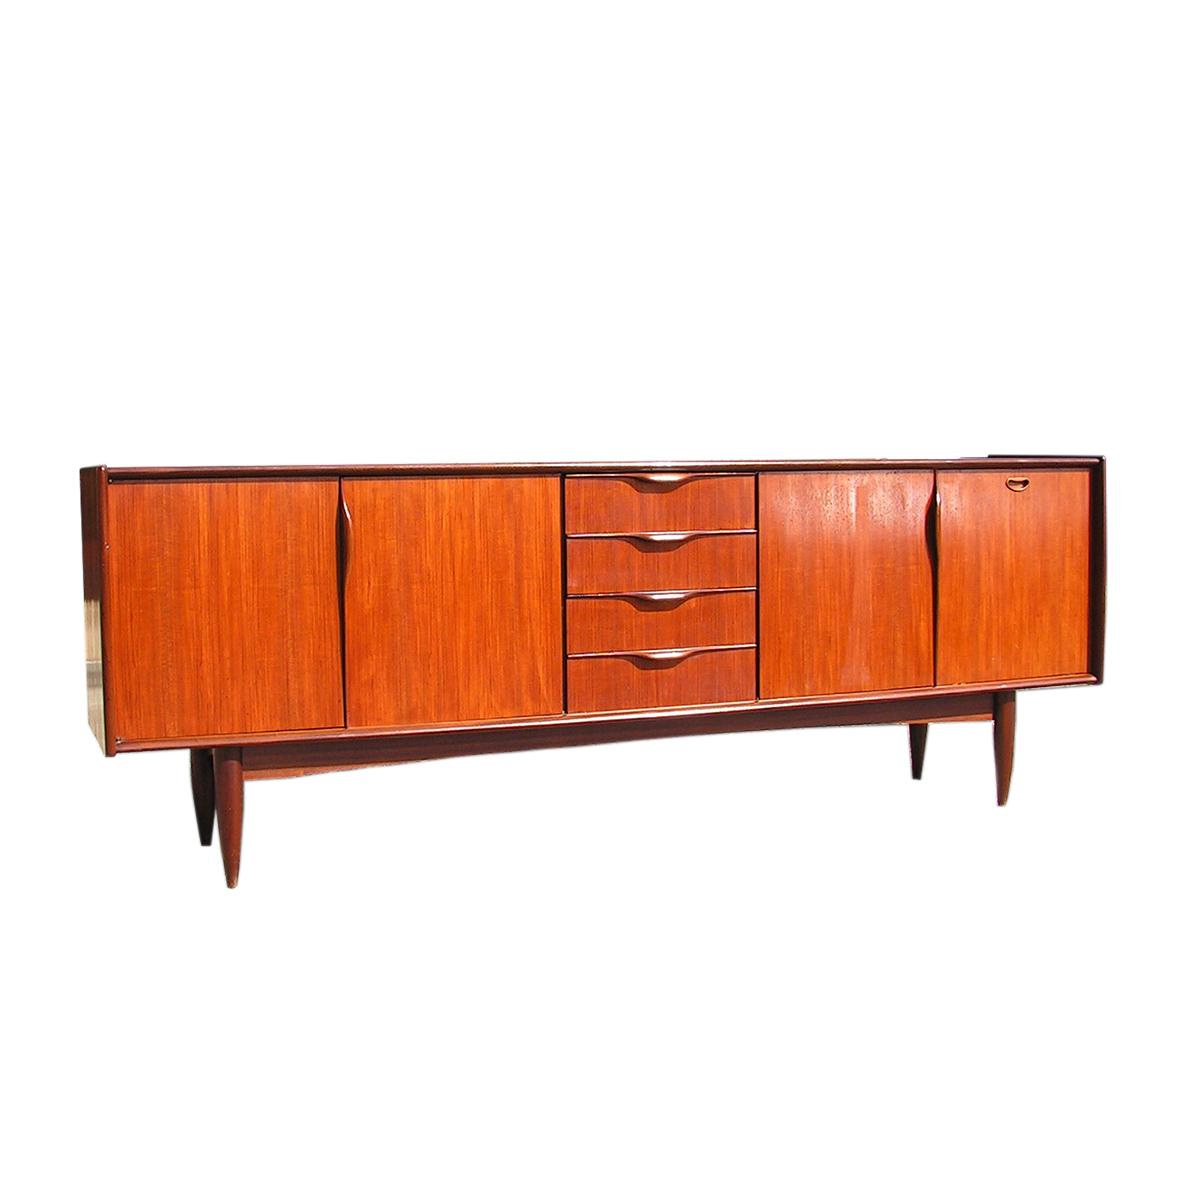 sideboard-teak-teck-fm-meubles-vintage